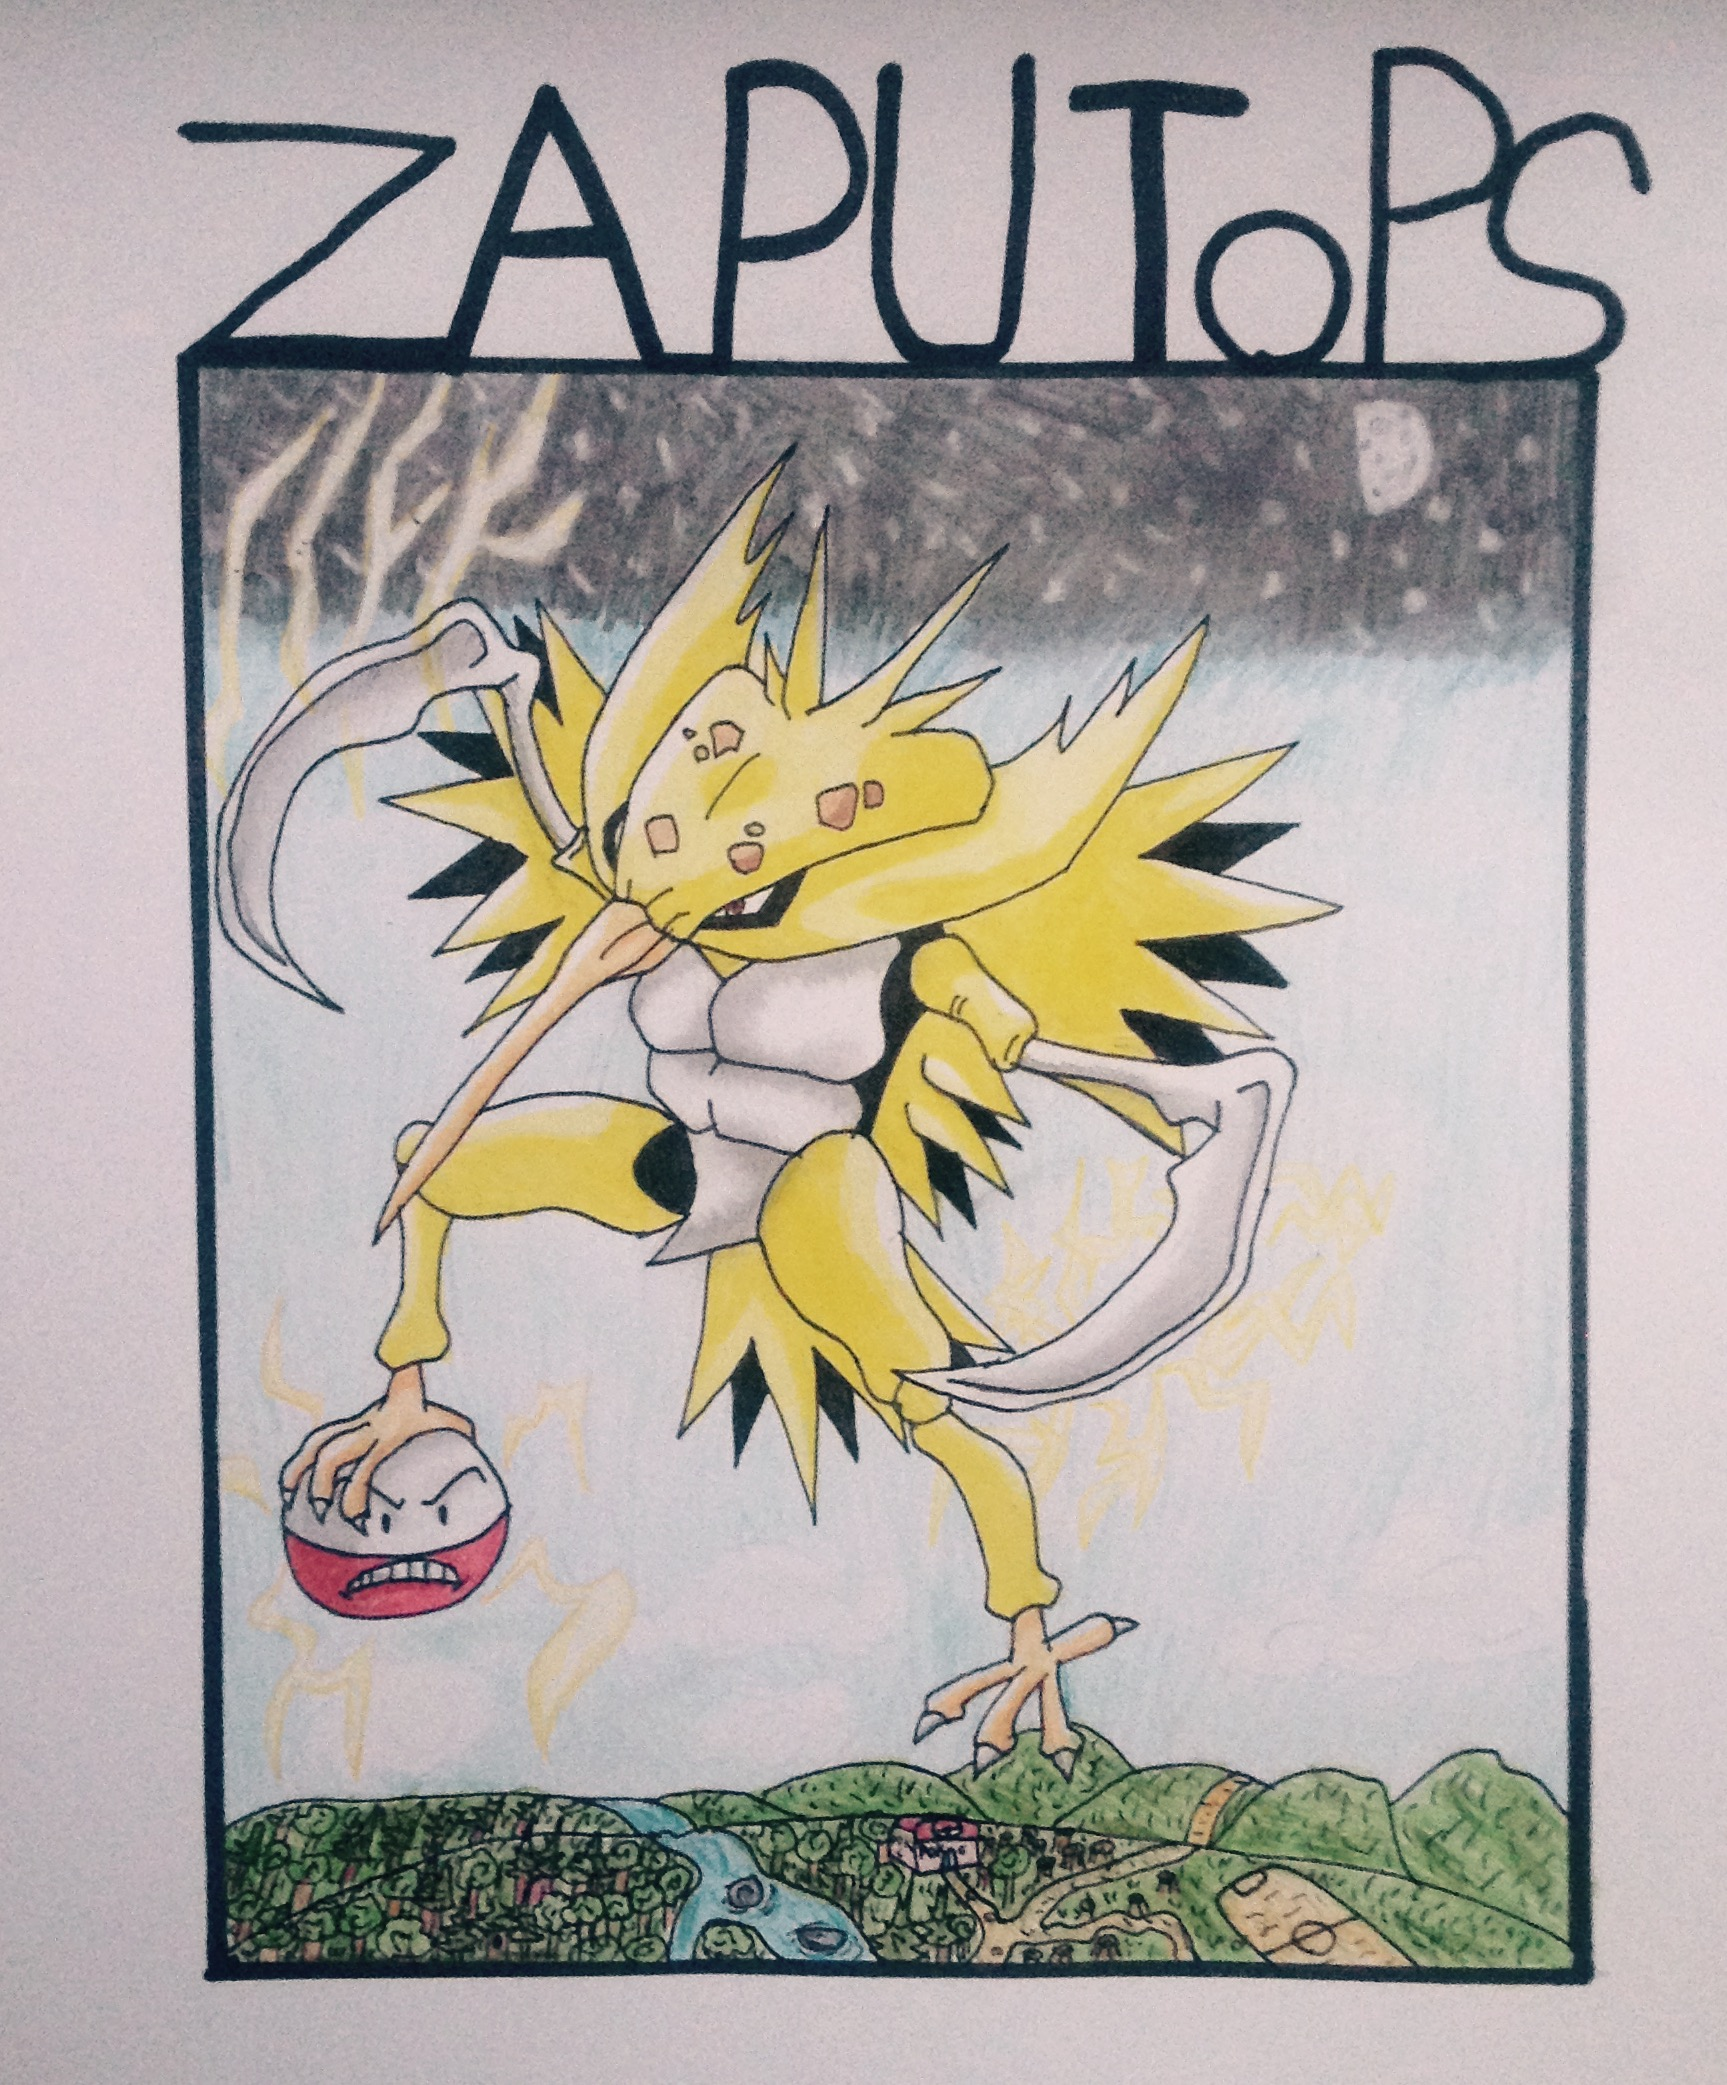 Kabutops + Zapdos = Zaputops